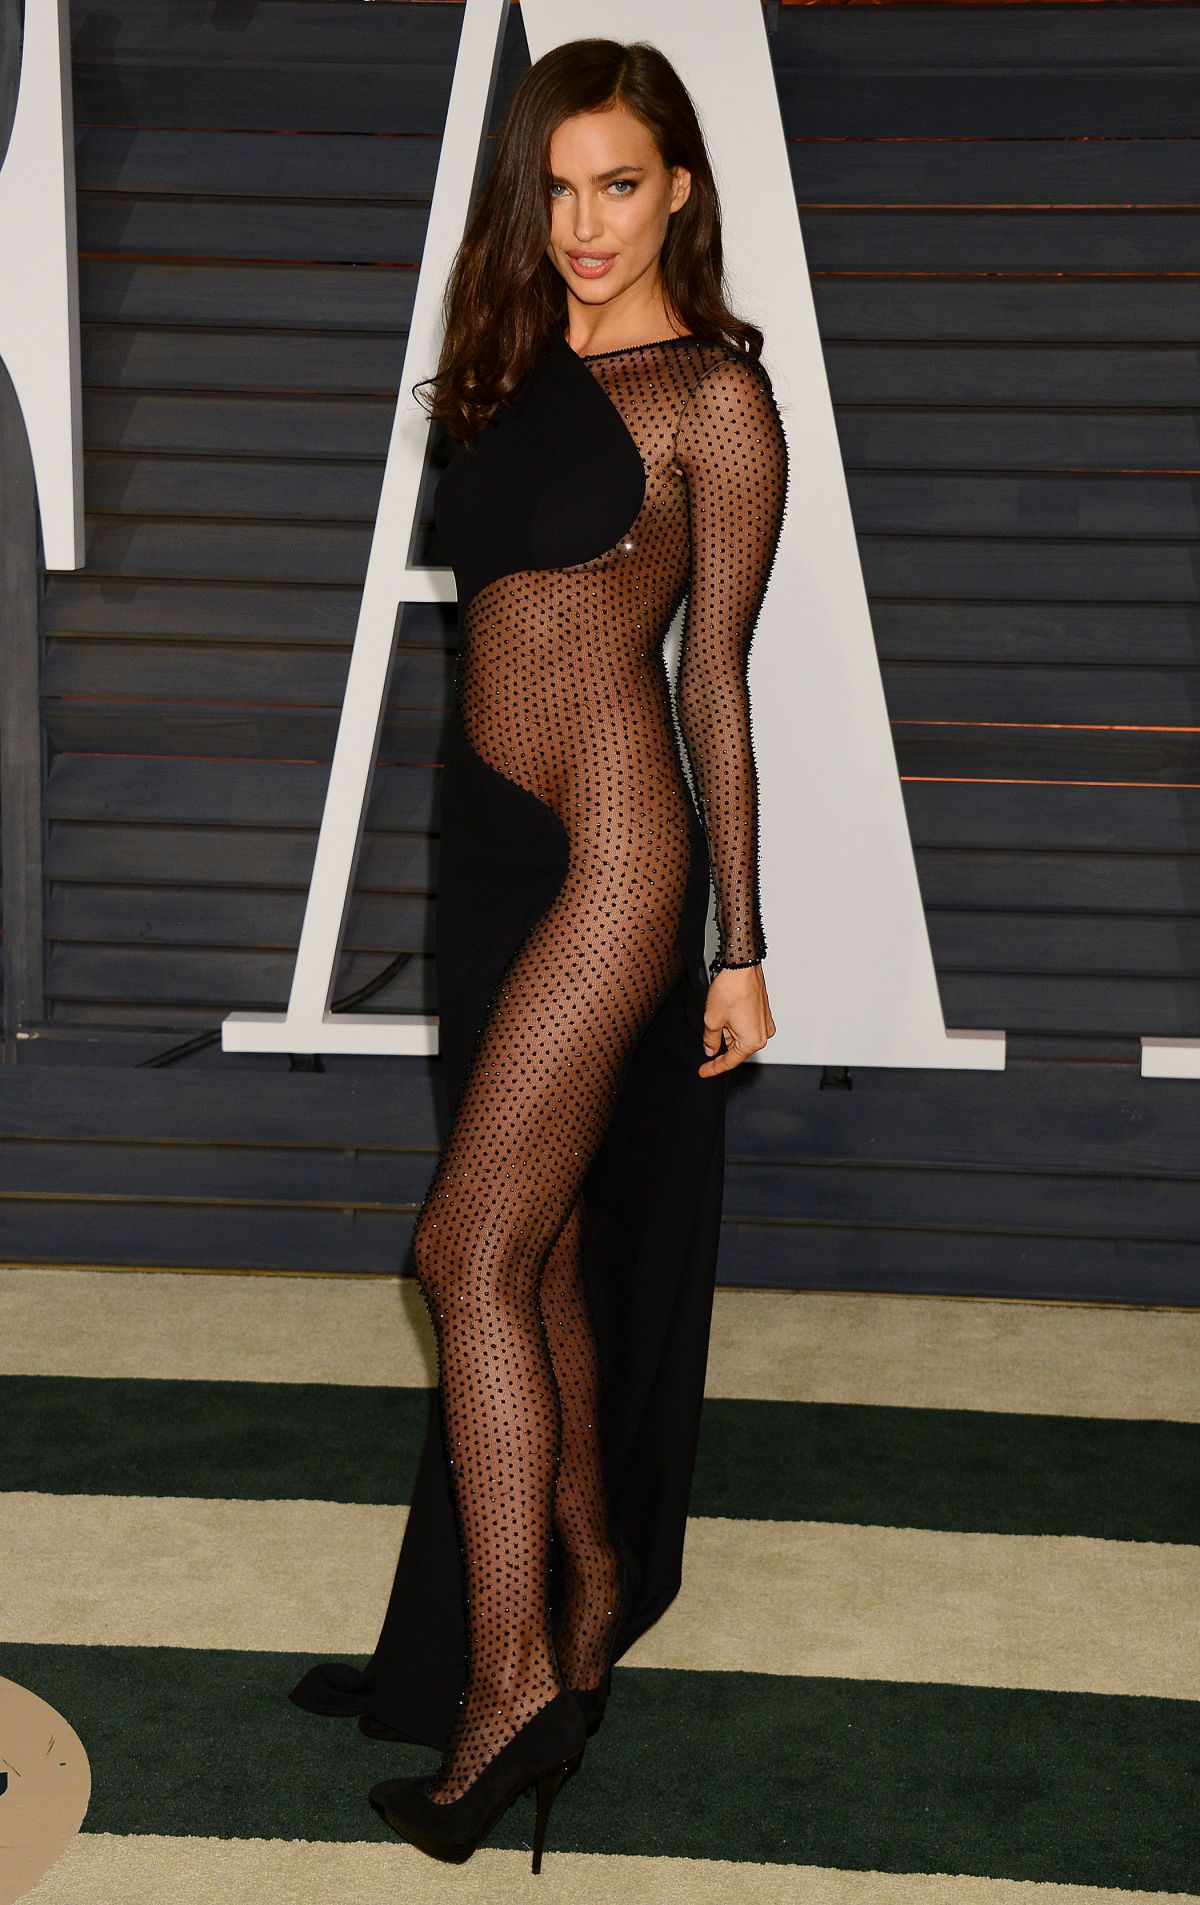 IRINA SHAYK at Vanity Fair Oscar Party in Hollywood